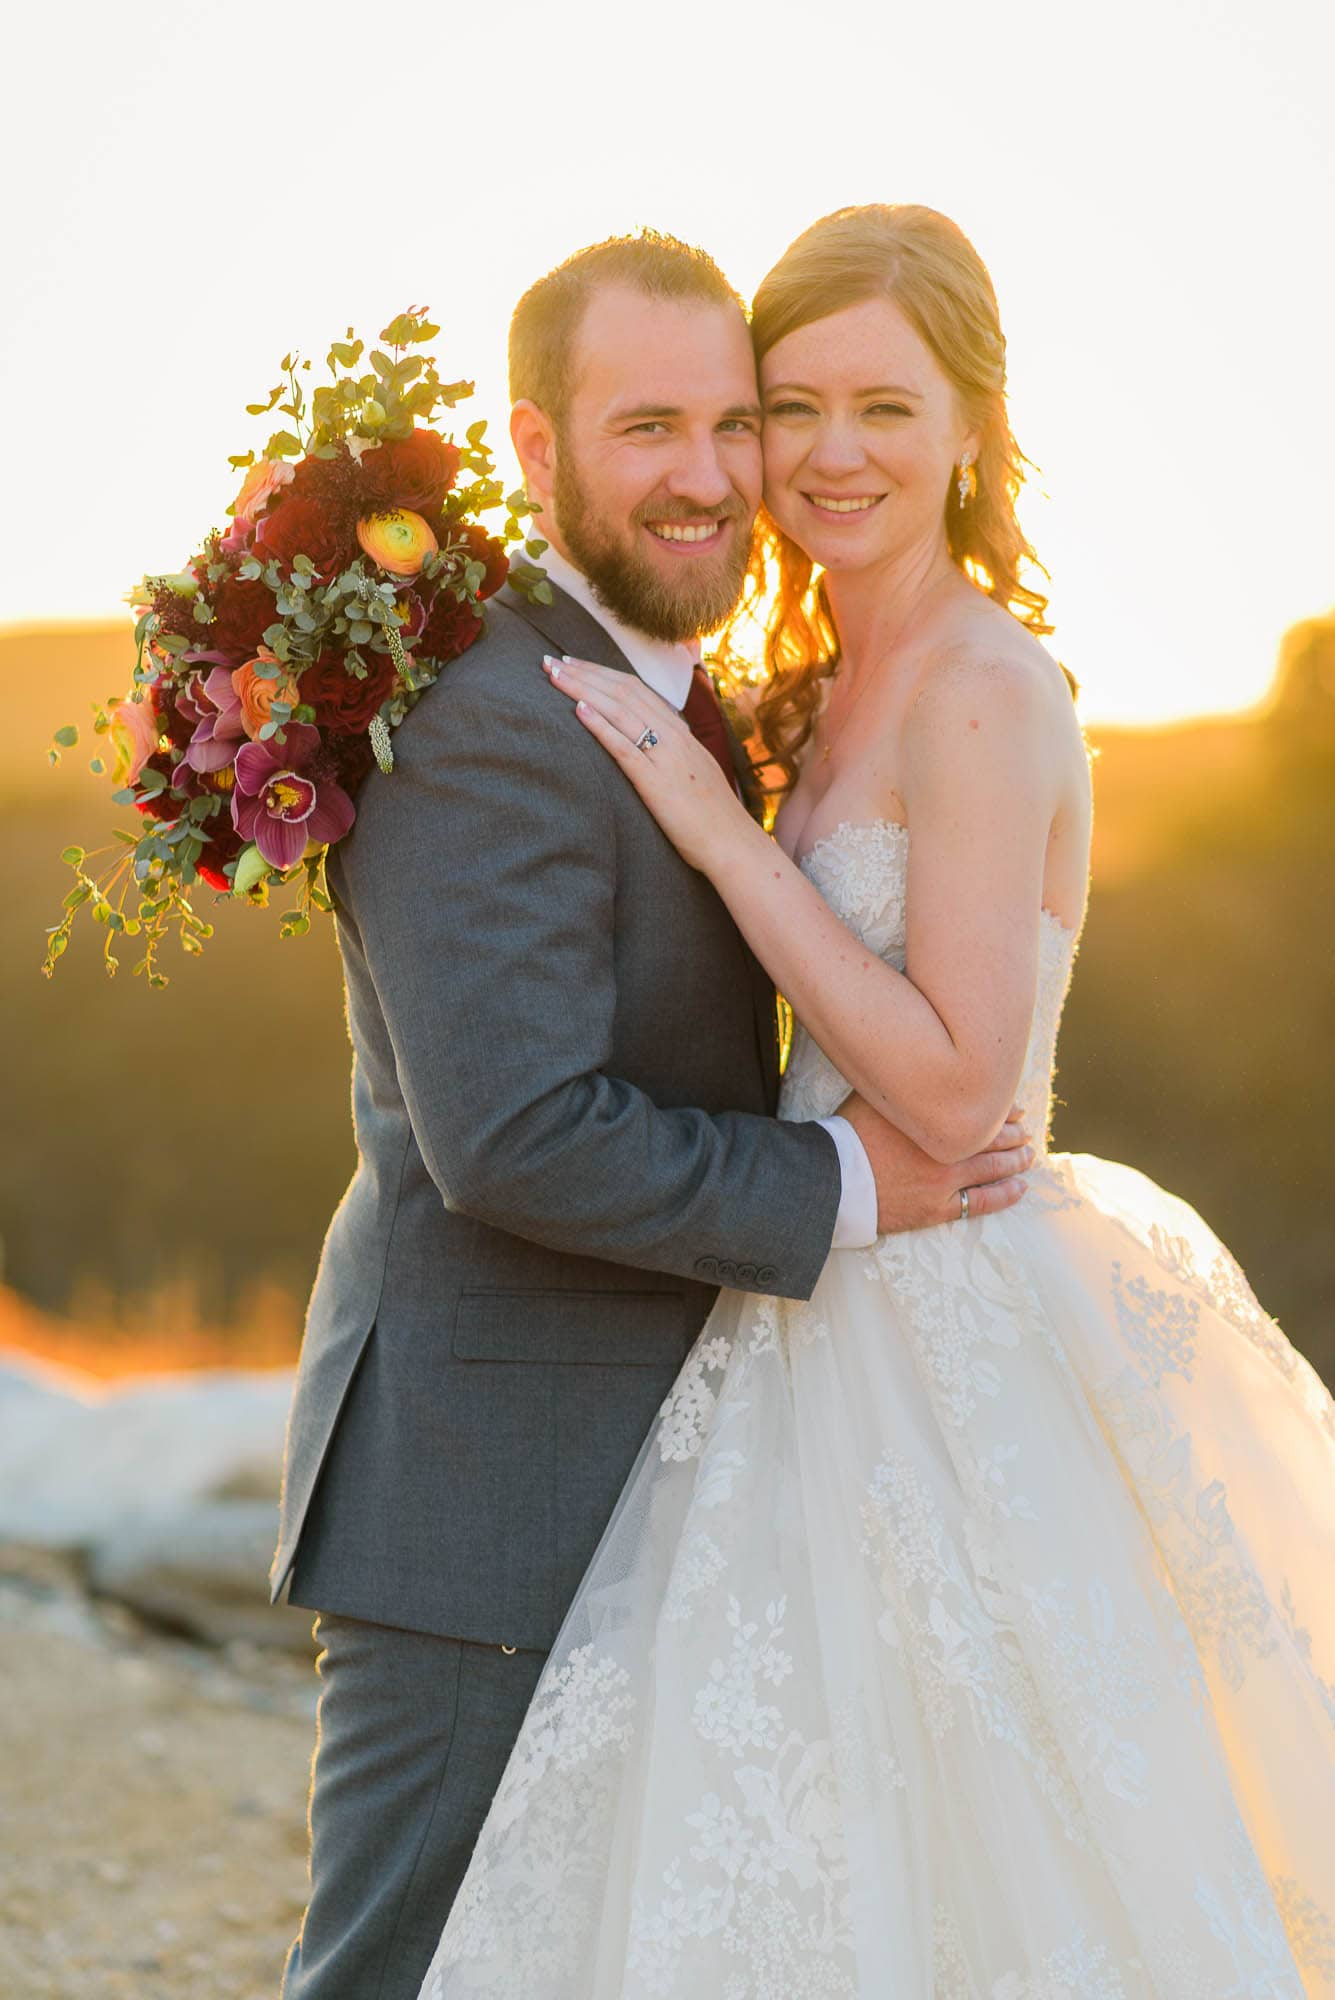 574_Alan_and_Heidi_Serendipity_Garden_Wedding_10-27-2018